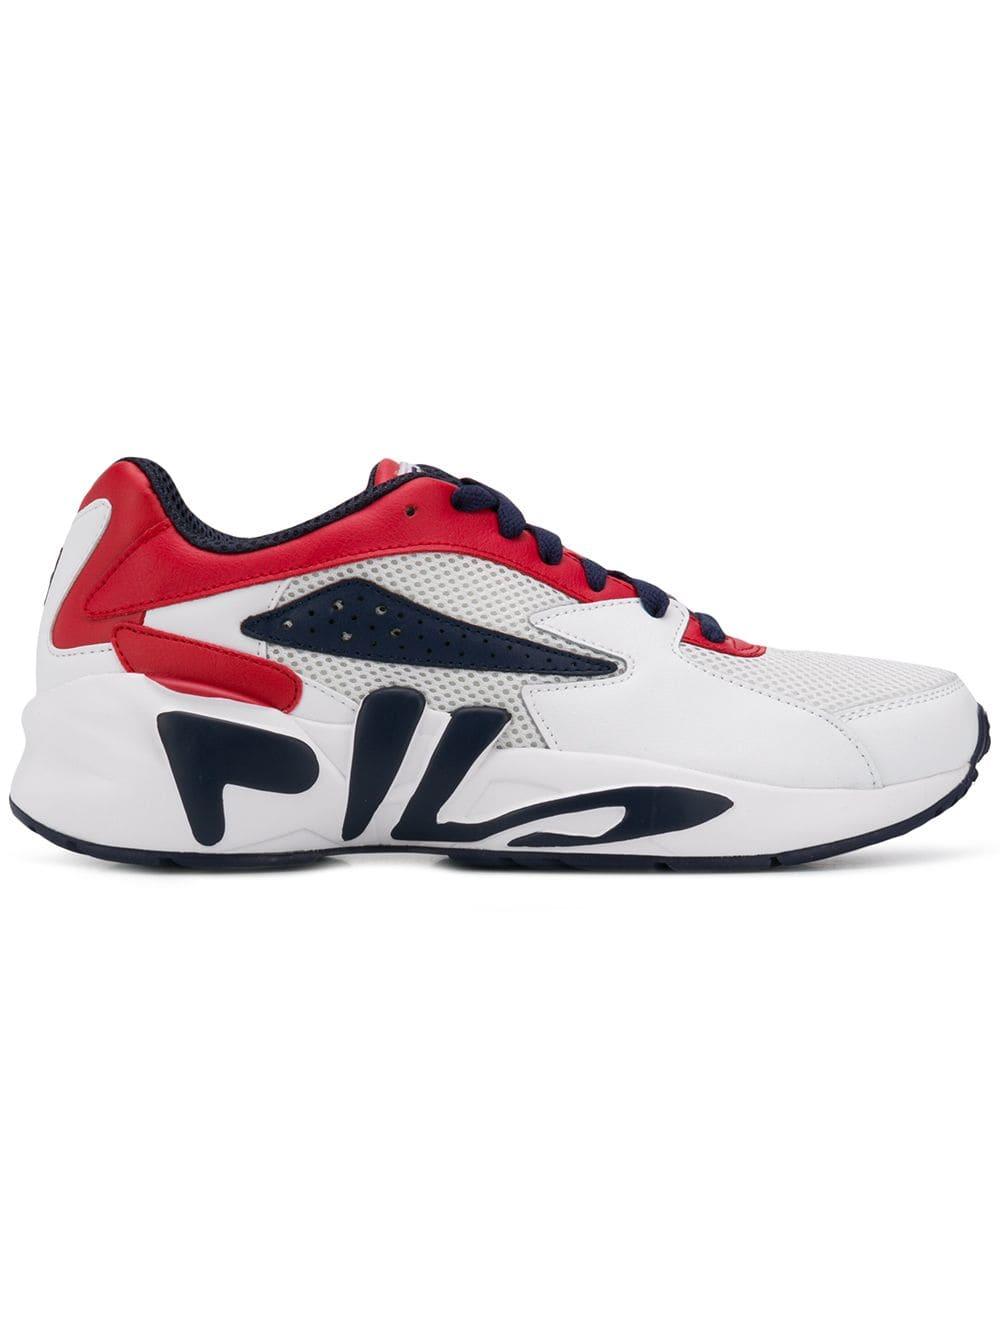 FILA FILA MINDBLOWER LACE UP SNEAKERS WHITE. #fila #shoes